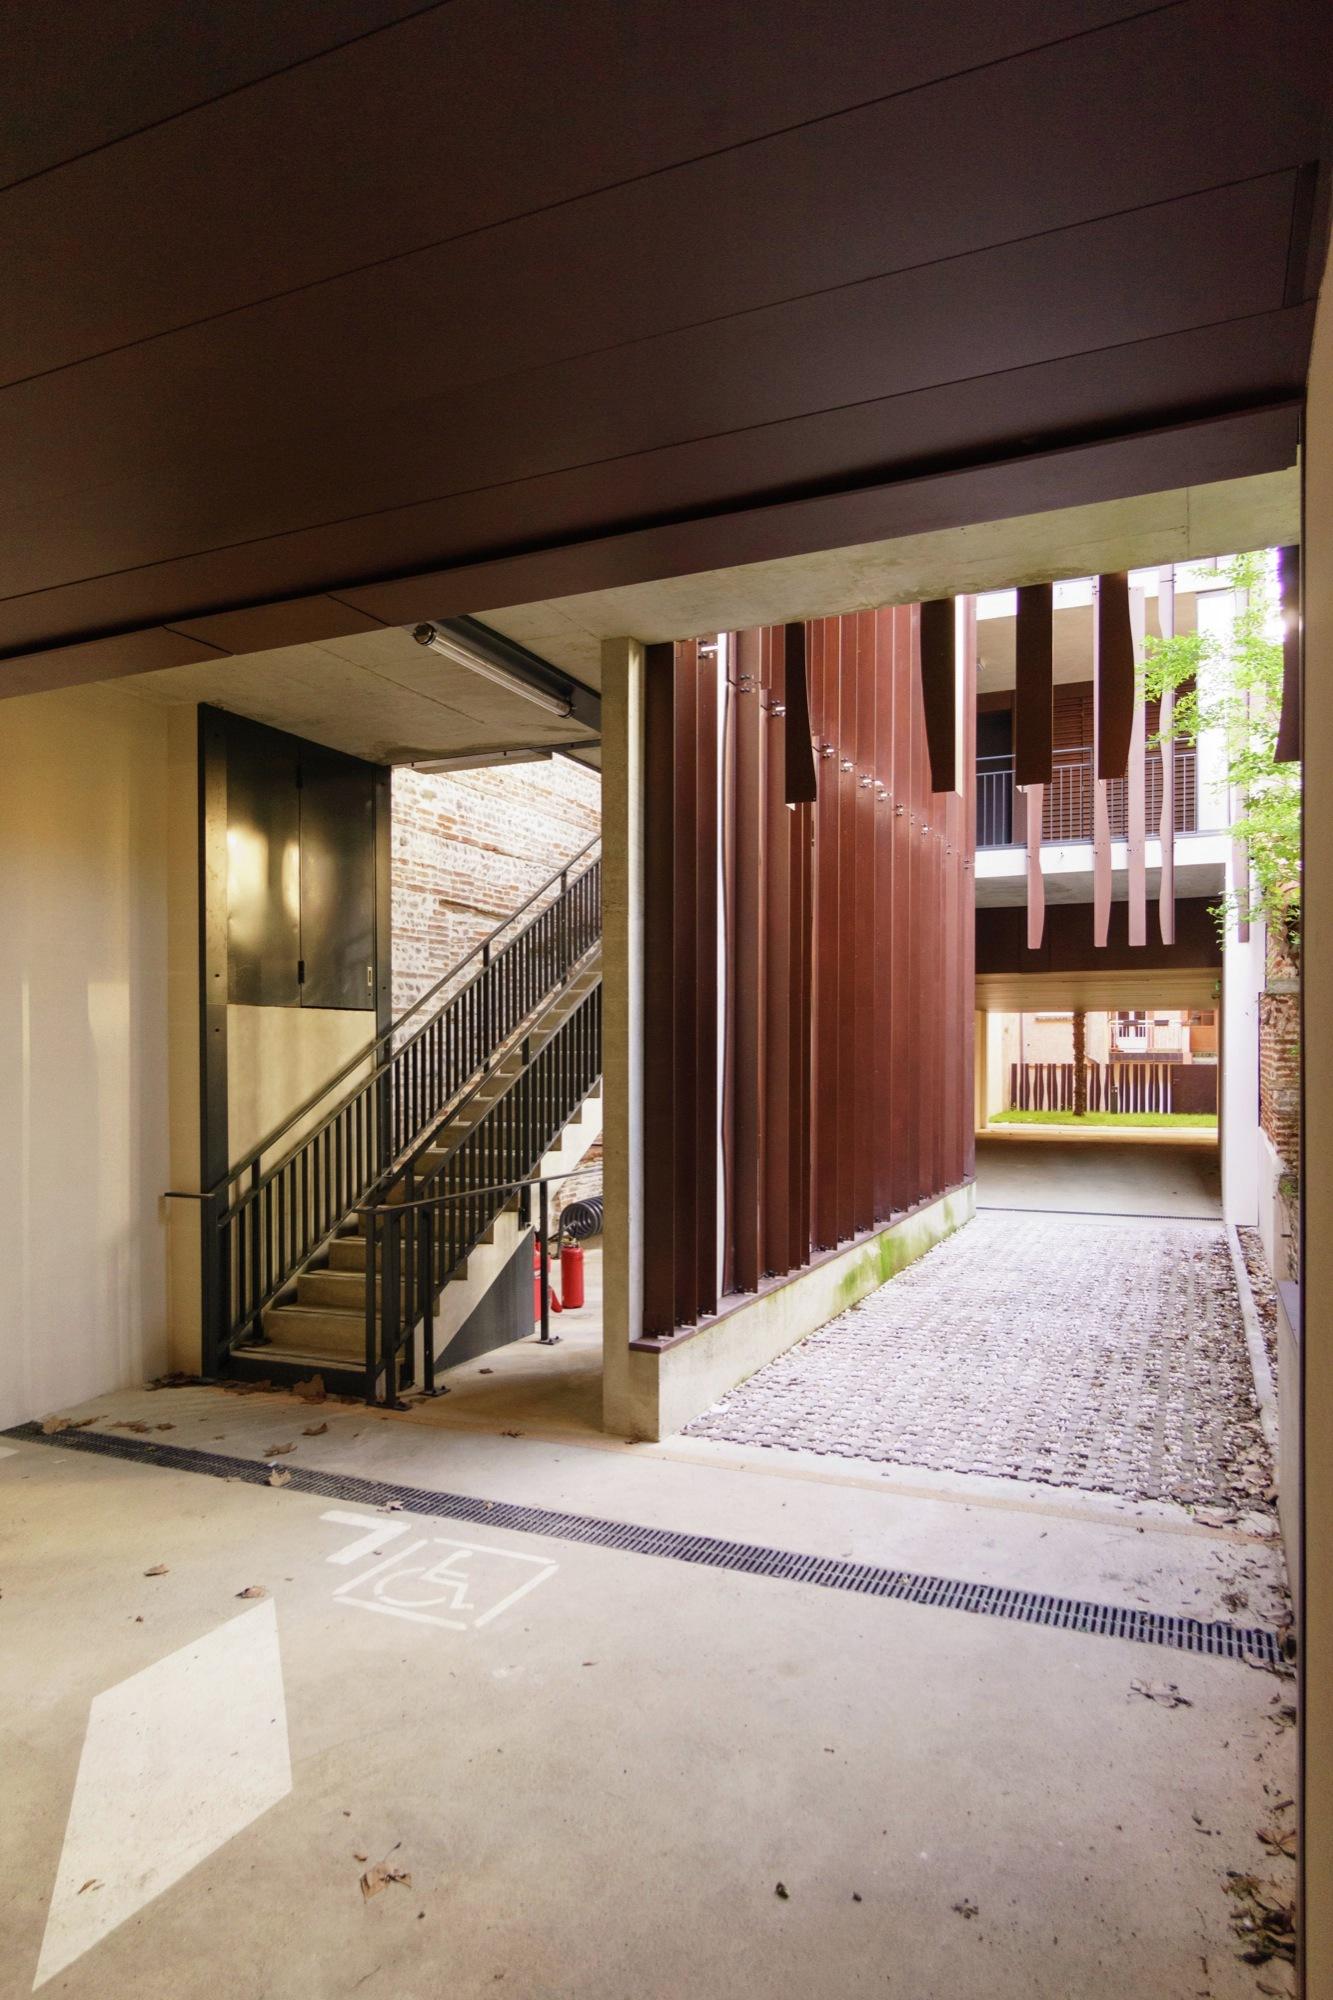 galer a de residencia yaoitcha taillandier architectes associ s 3. Black Bedroom Furniture Sets. Home Design Ideas